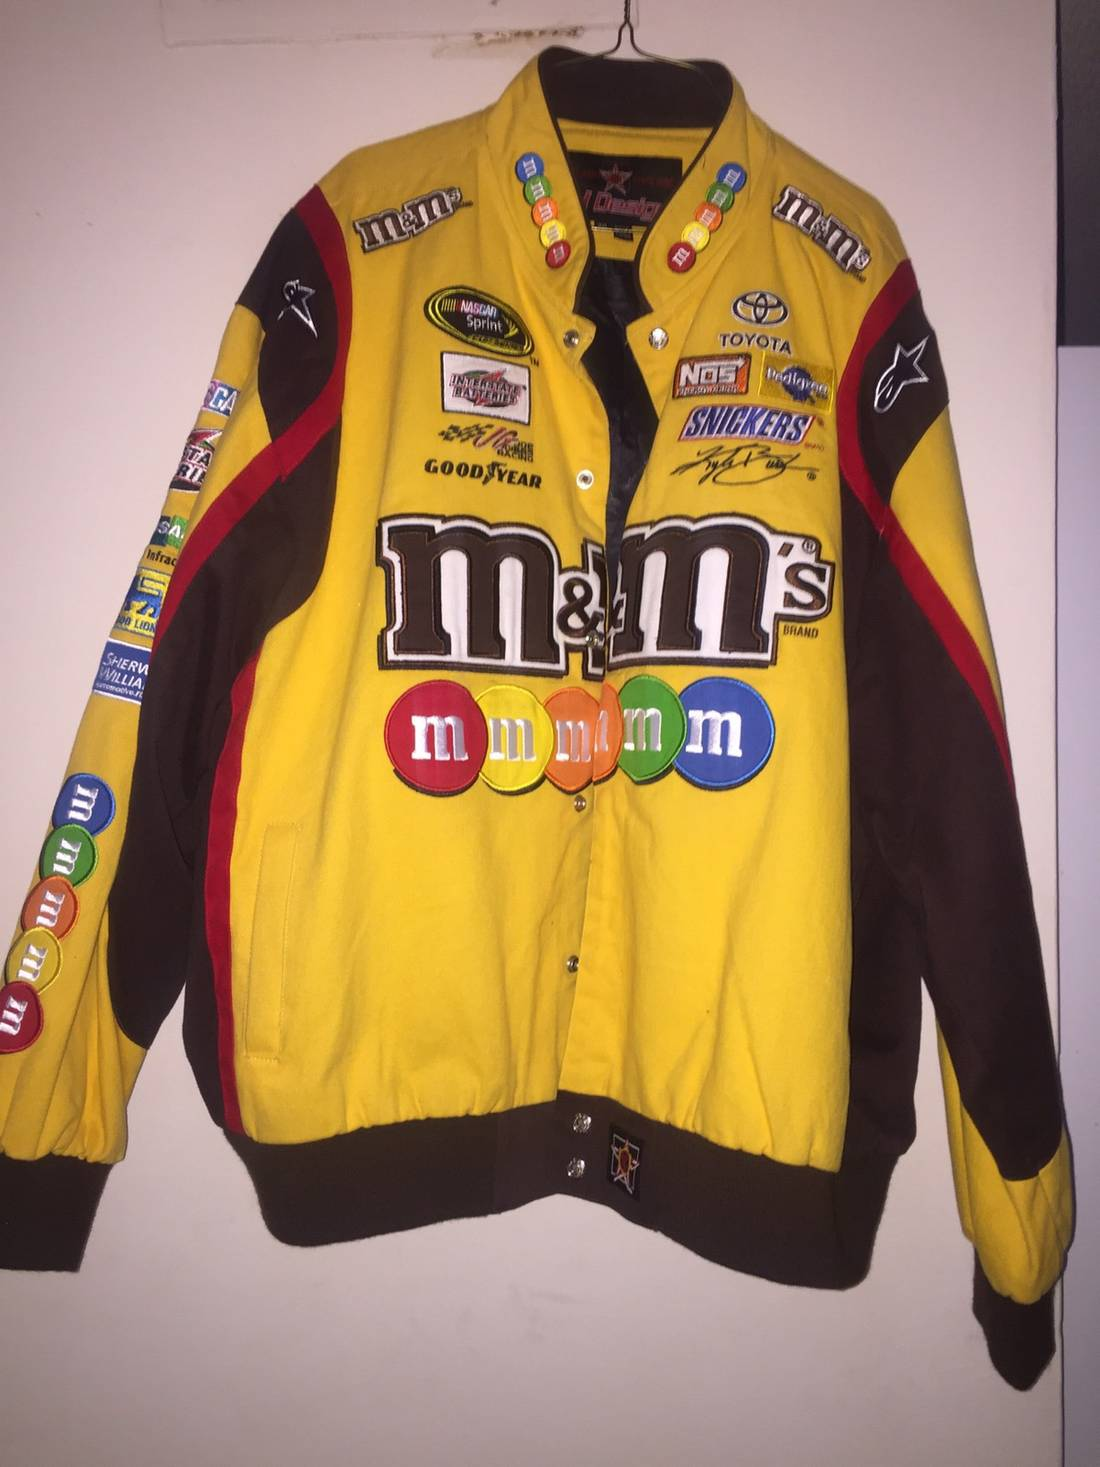 jh design kyle busch racing jacket size xxl heavy coats for sale